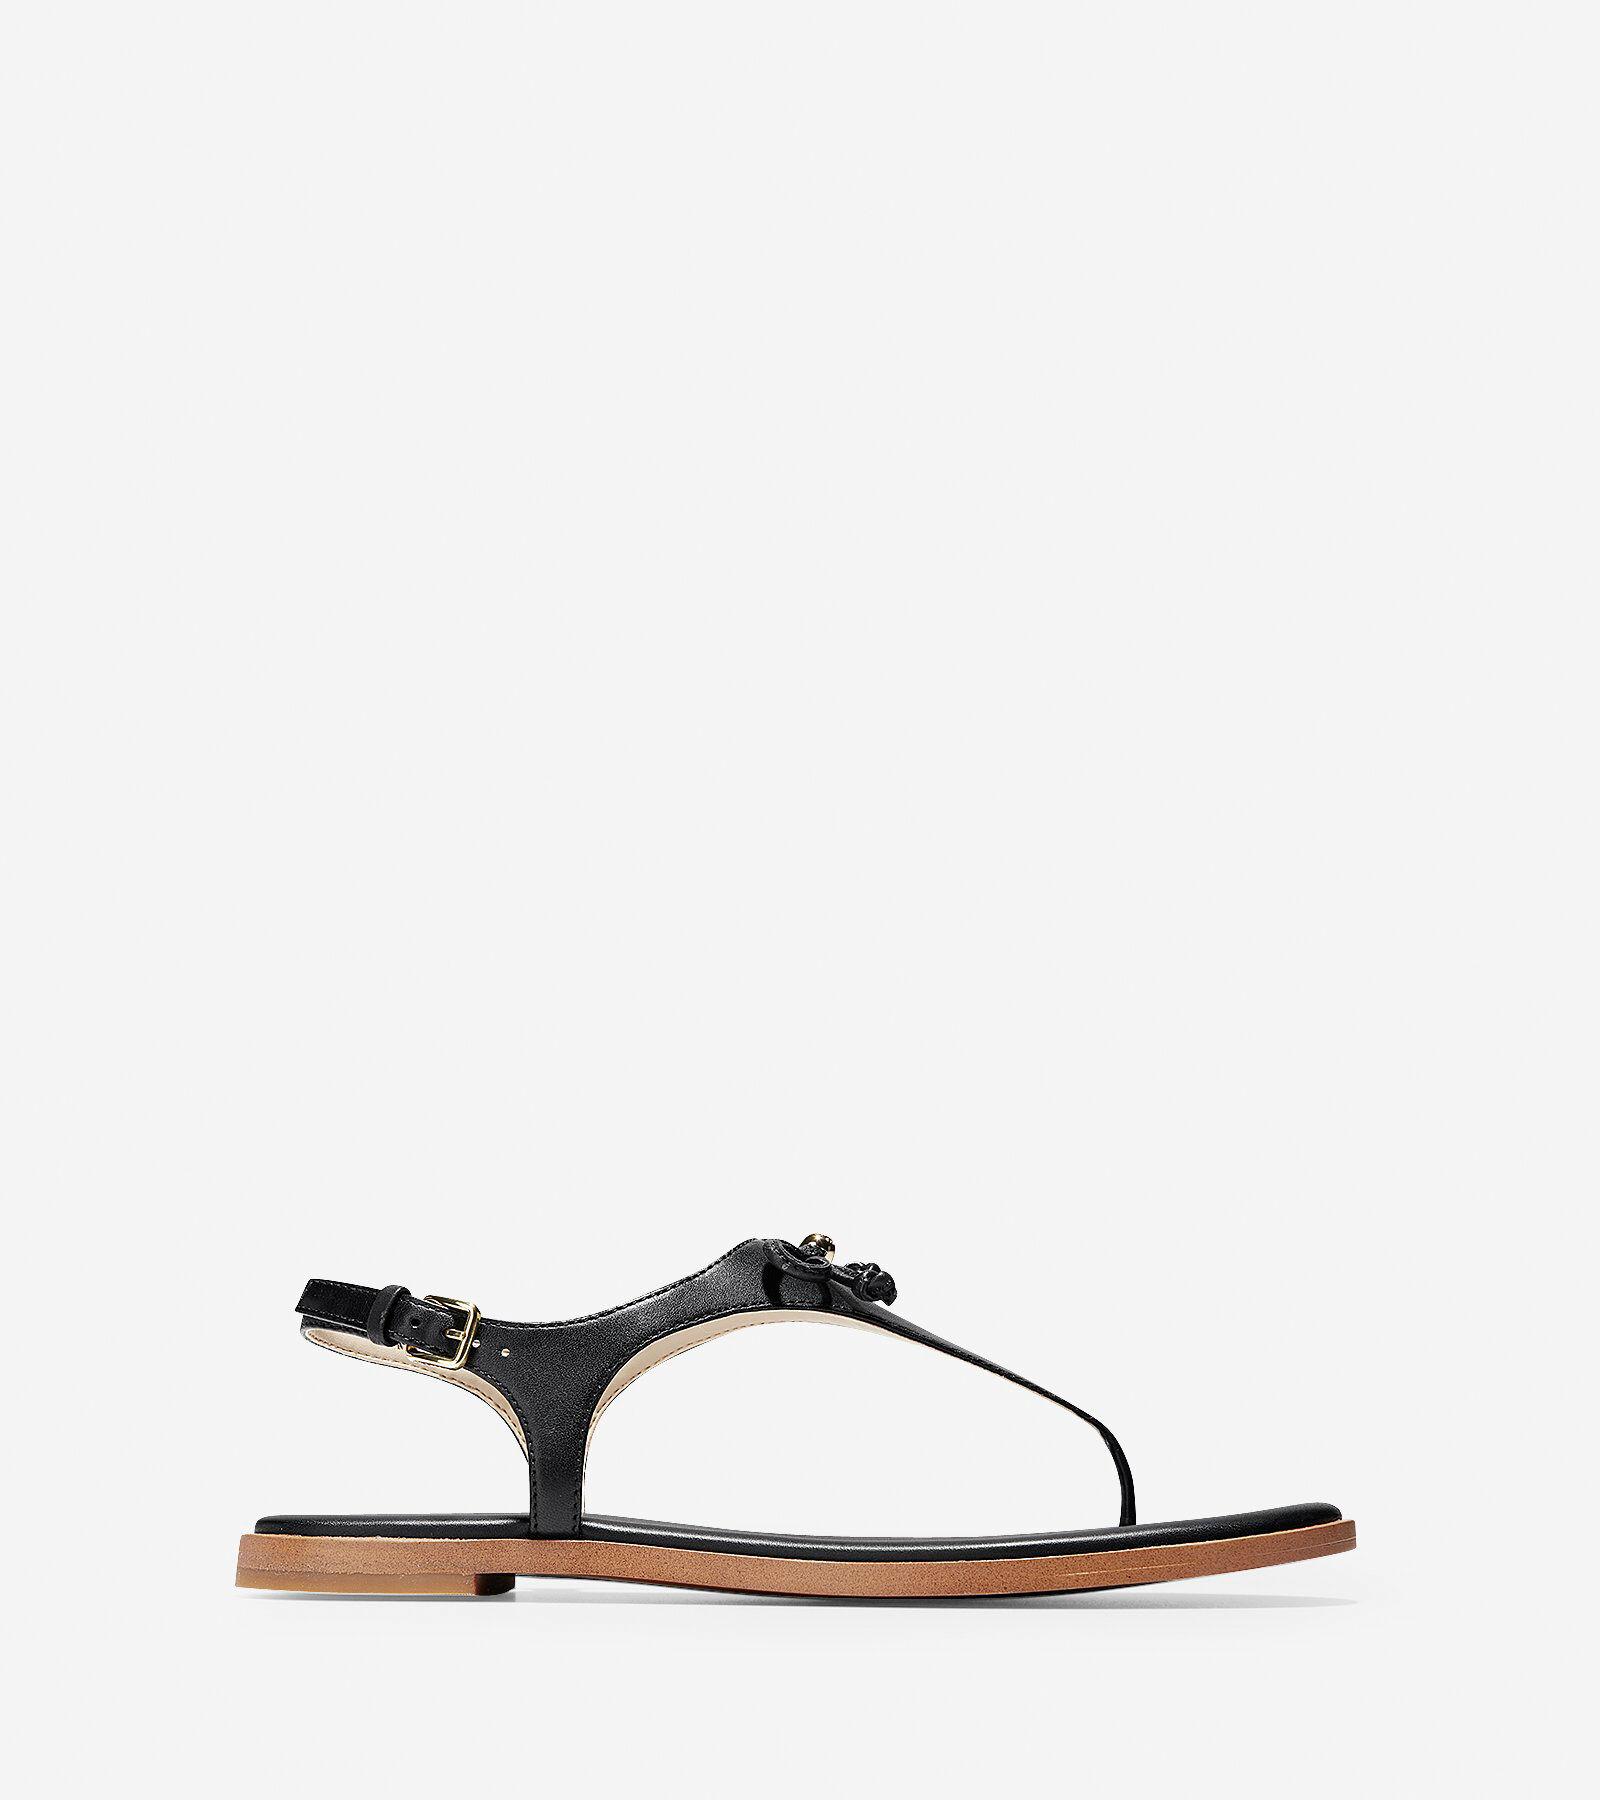 Cole Haan Findra Thong Sandal 5O7yu9iP